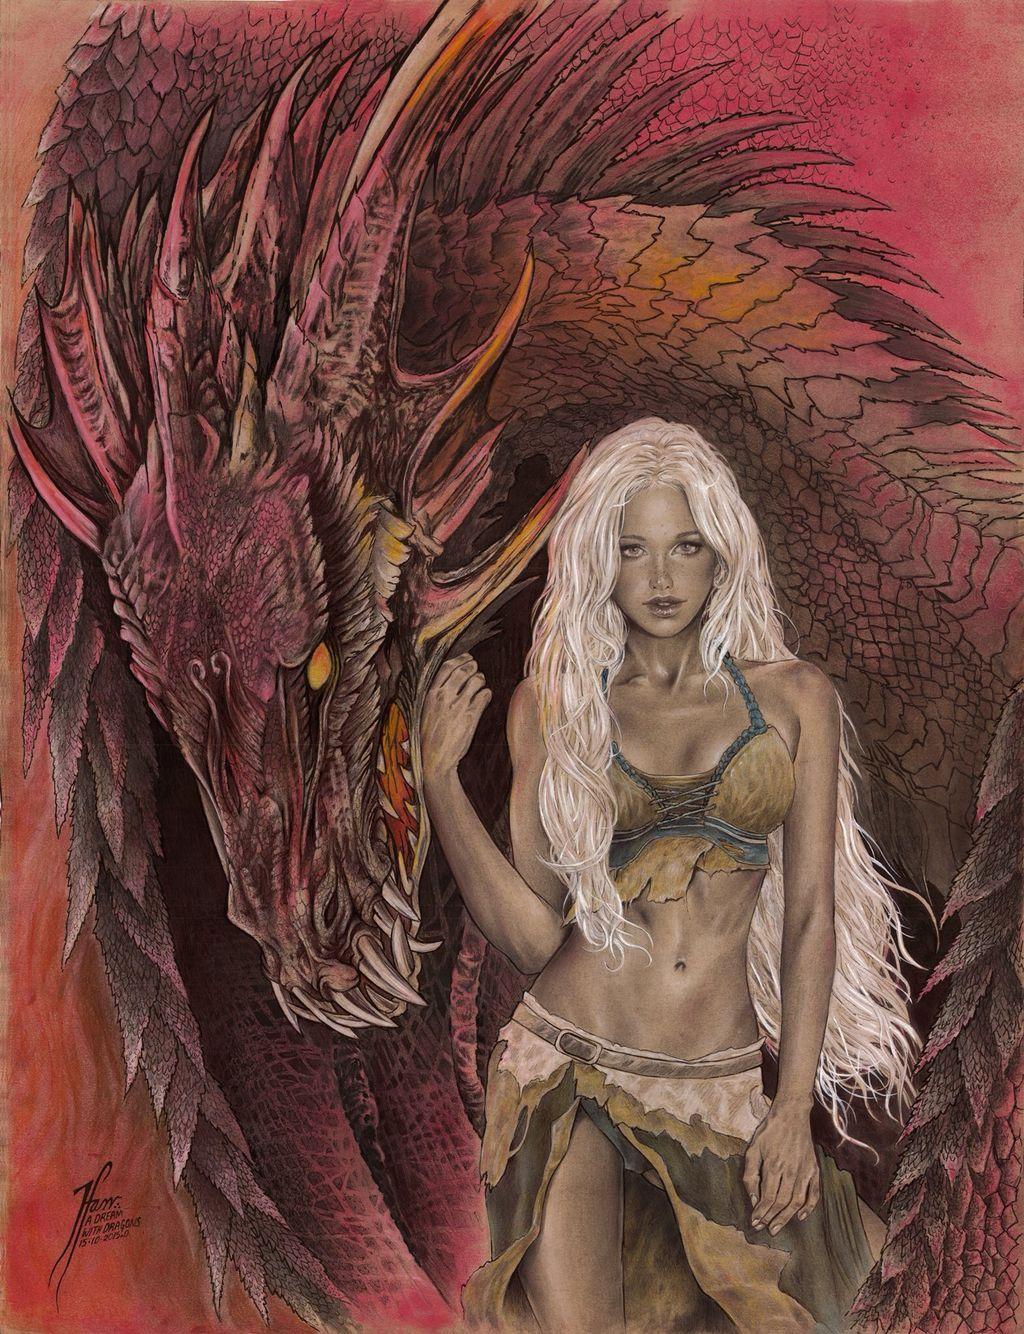 """A Dream with Dragons"" my interpretation of Daenerys Targaryen with her Drogon   #gameofthrones #asongoficeandfire #dragon #reddragon #artoftehanifarr #targaryen #daenarys #illustration"